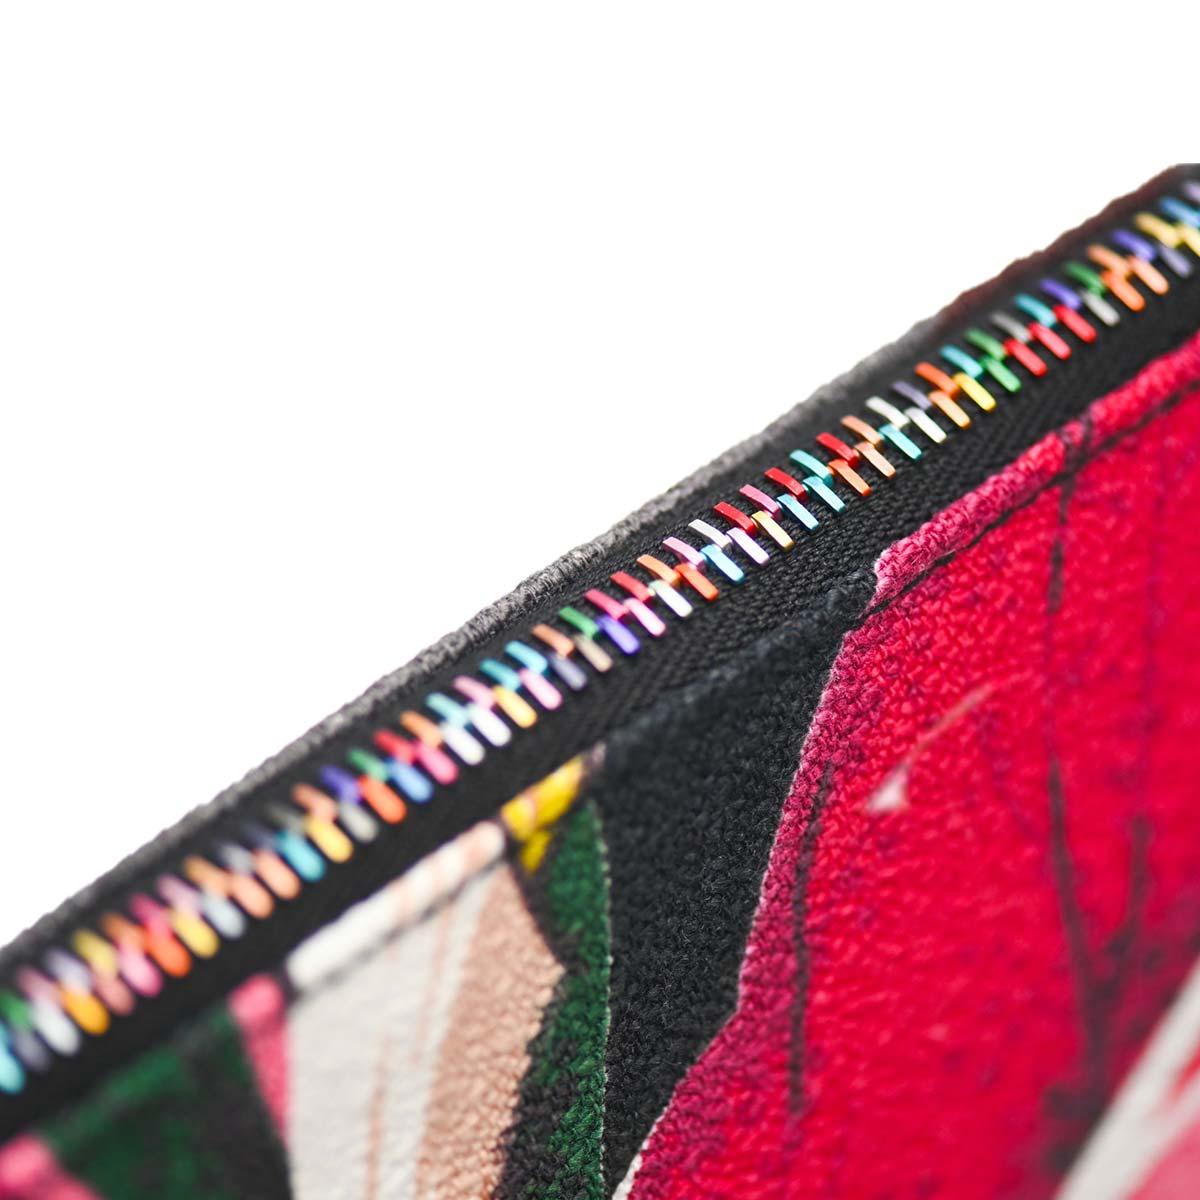 clutch bag tropical leaf motif on black DSC 6205